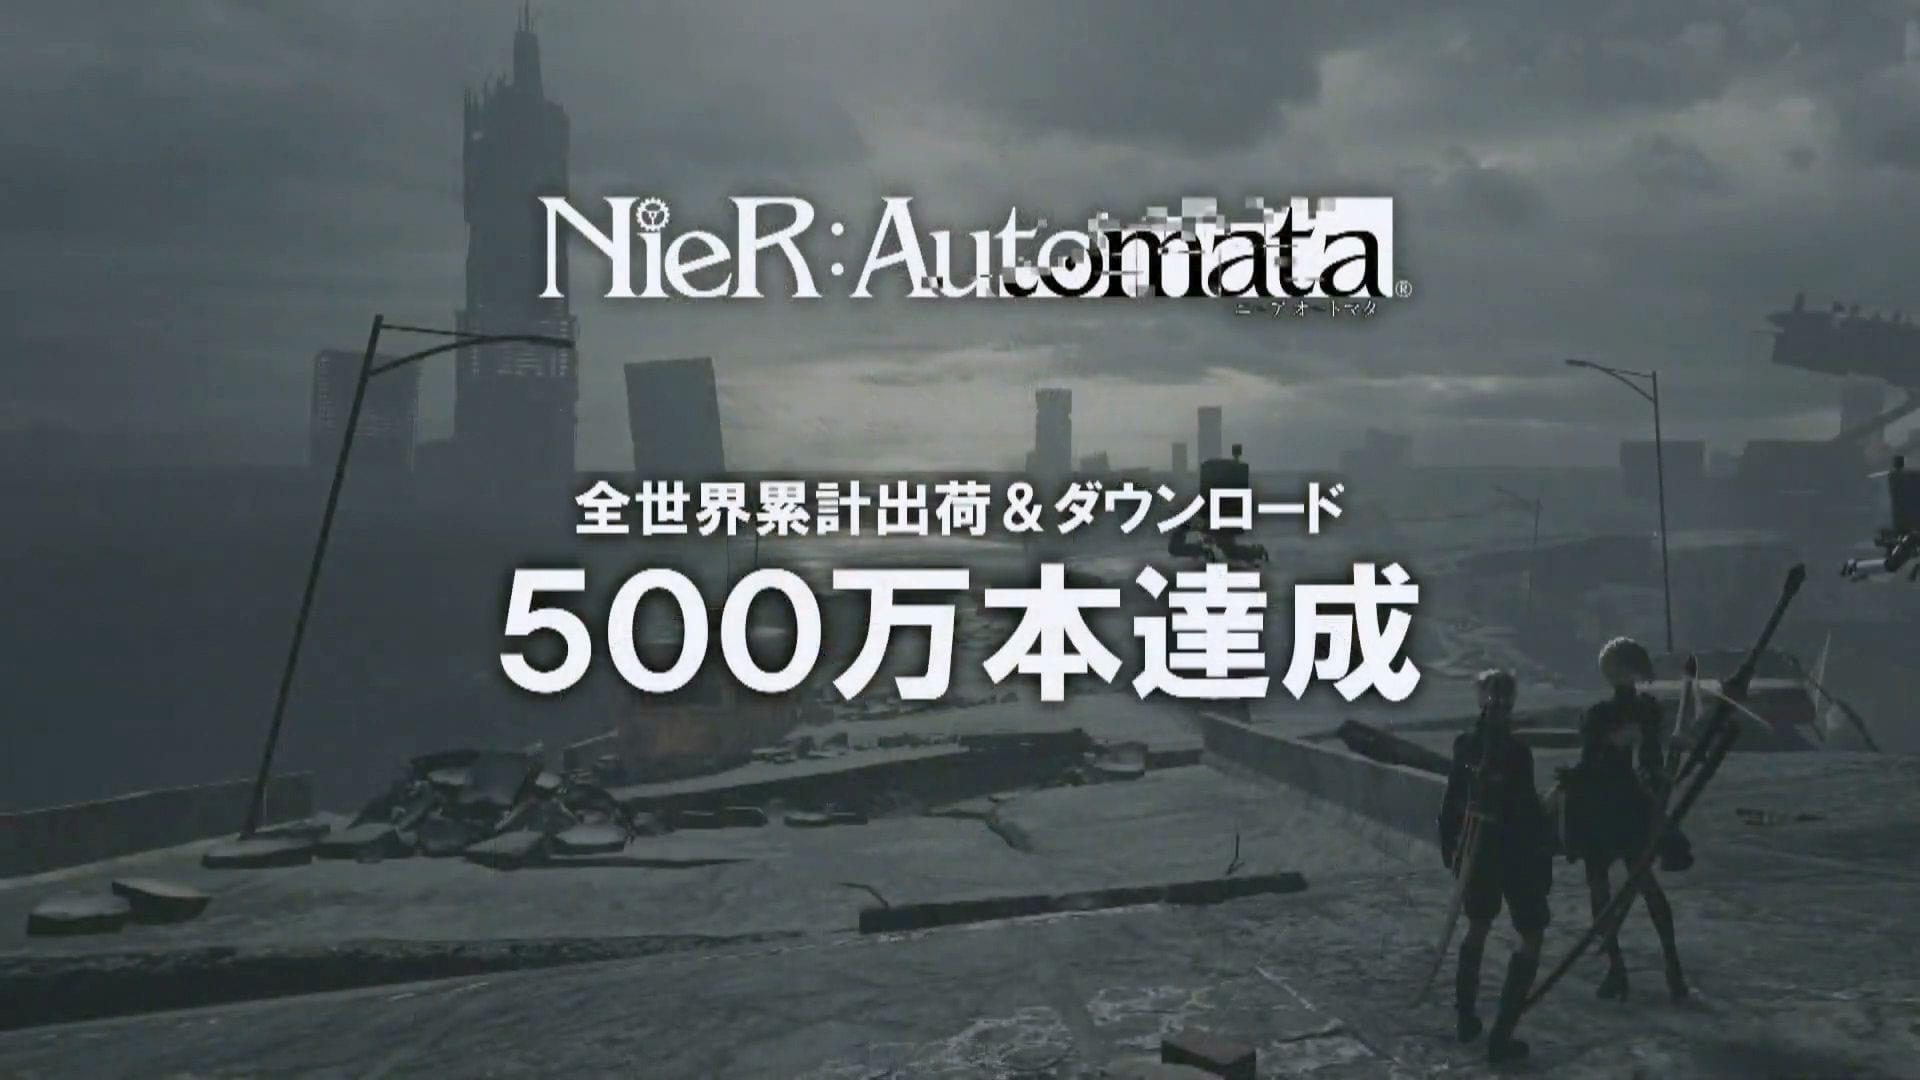 NieR: Automata Has Shipped Over 5 Million Copies; Manga Introduced 1